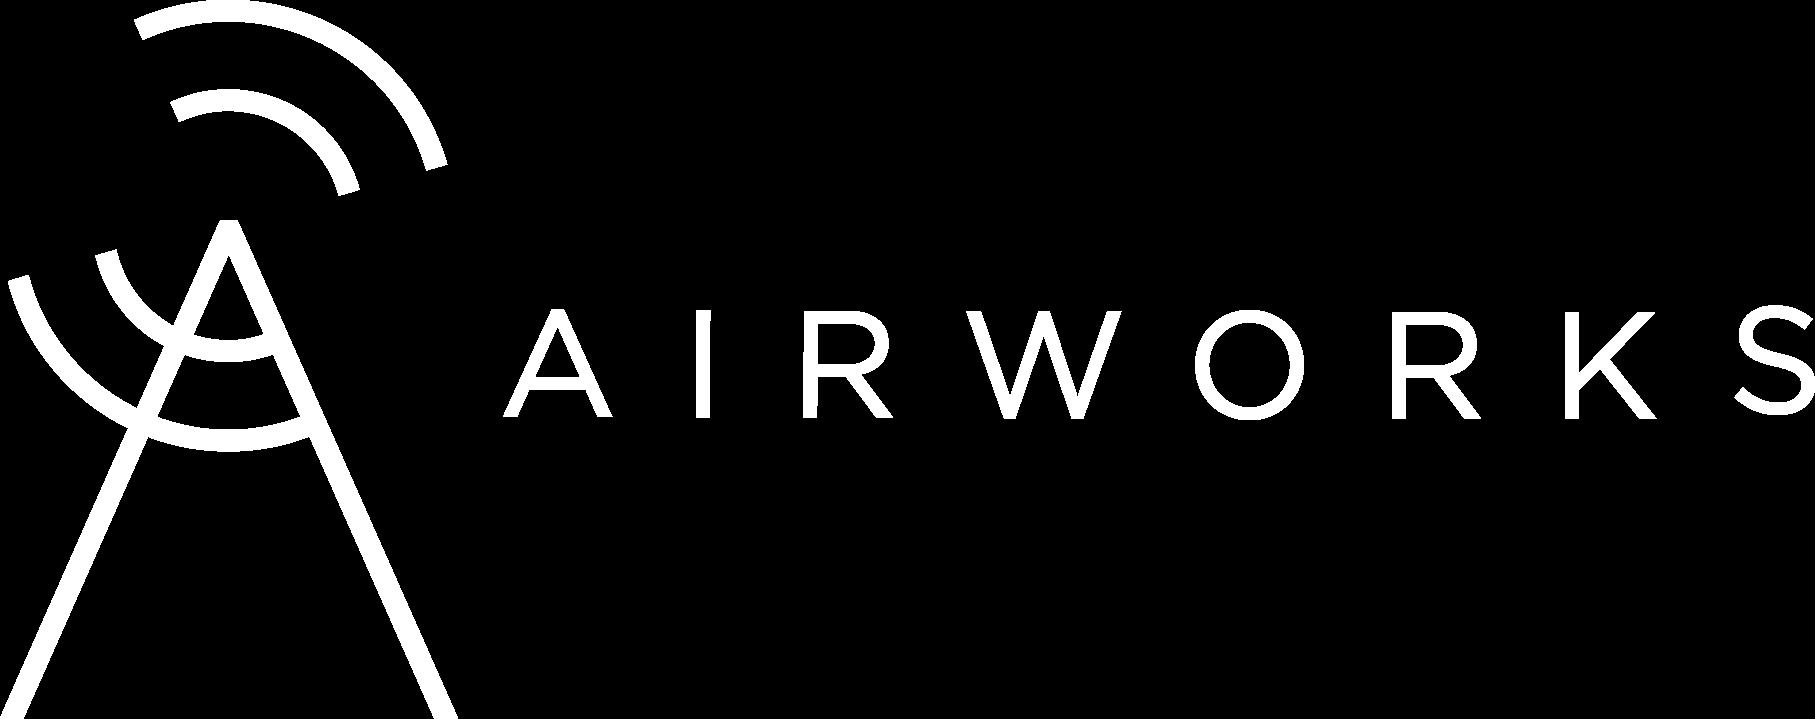 DJI | Airworks